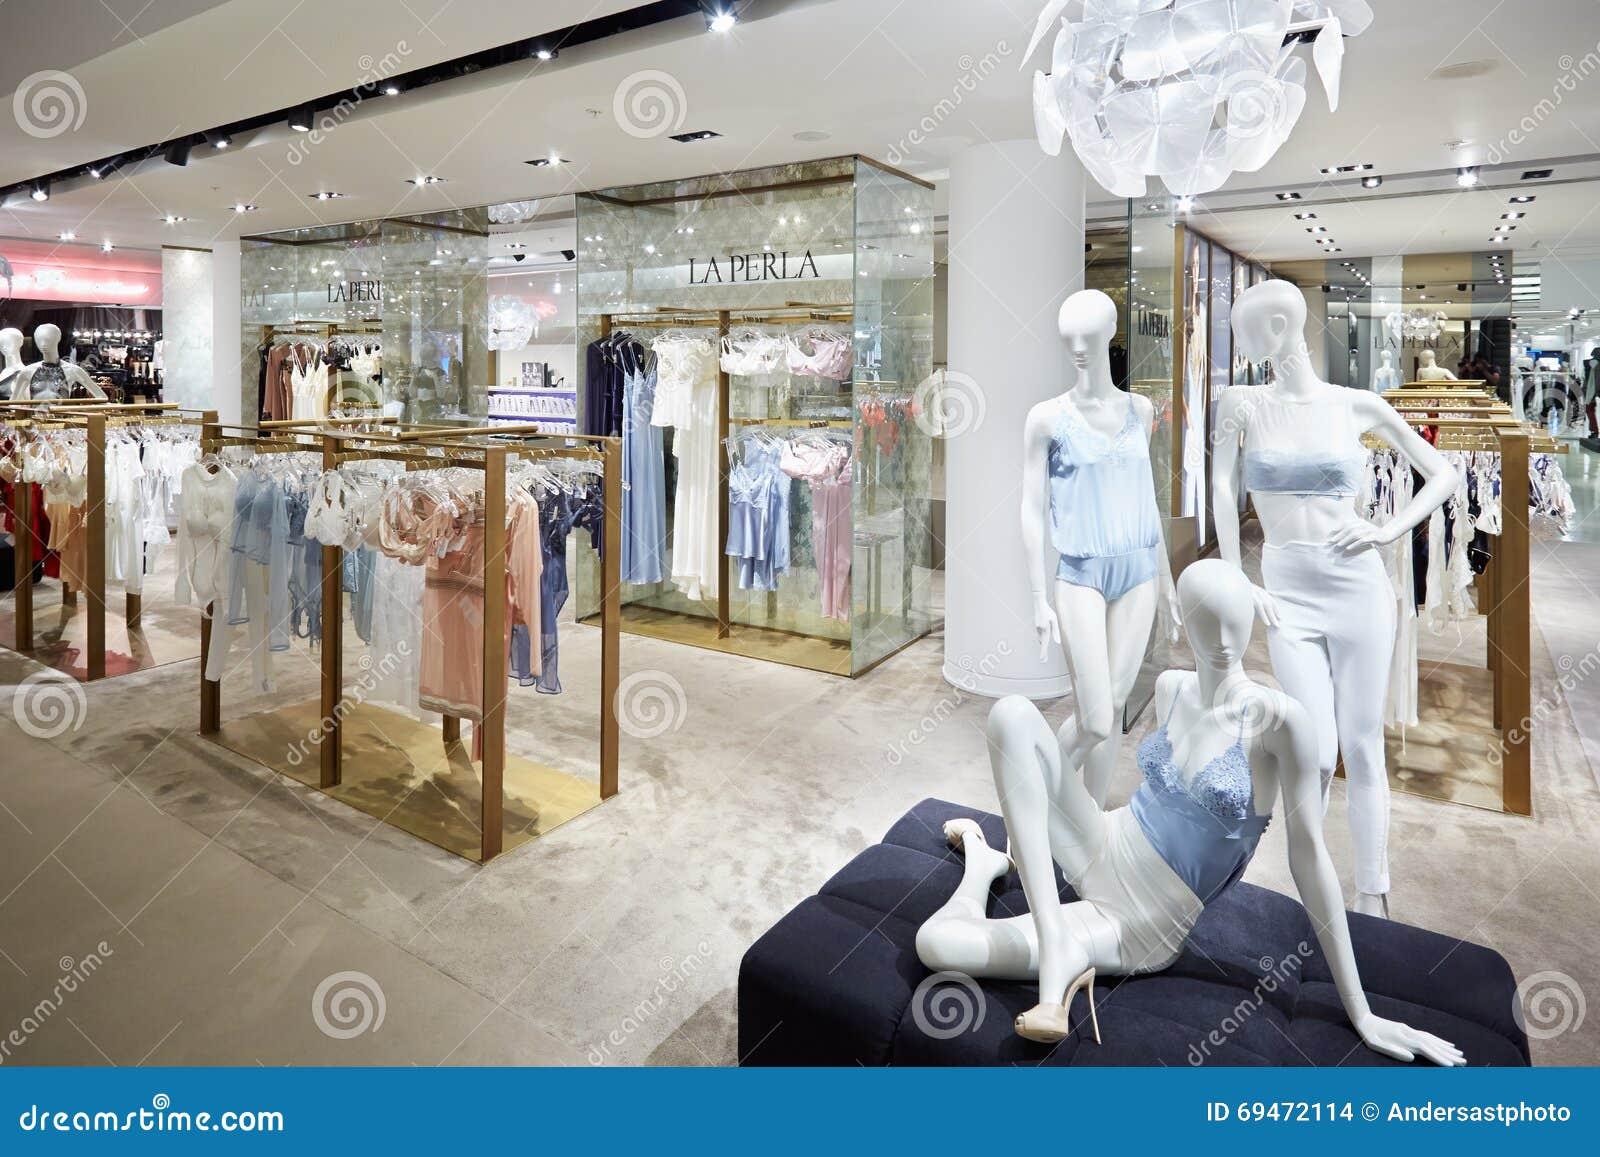 Selfridges Department Store Interior, La Perla In London Editorial ...